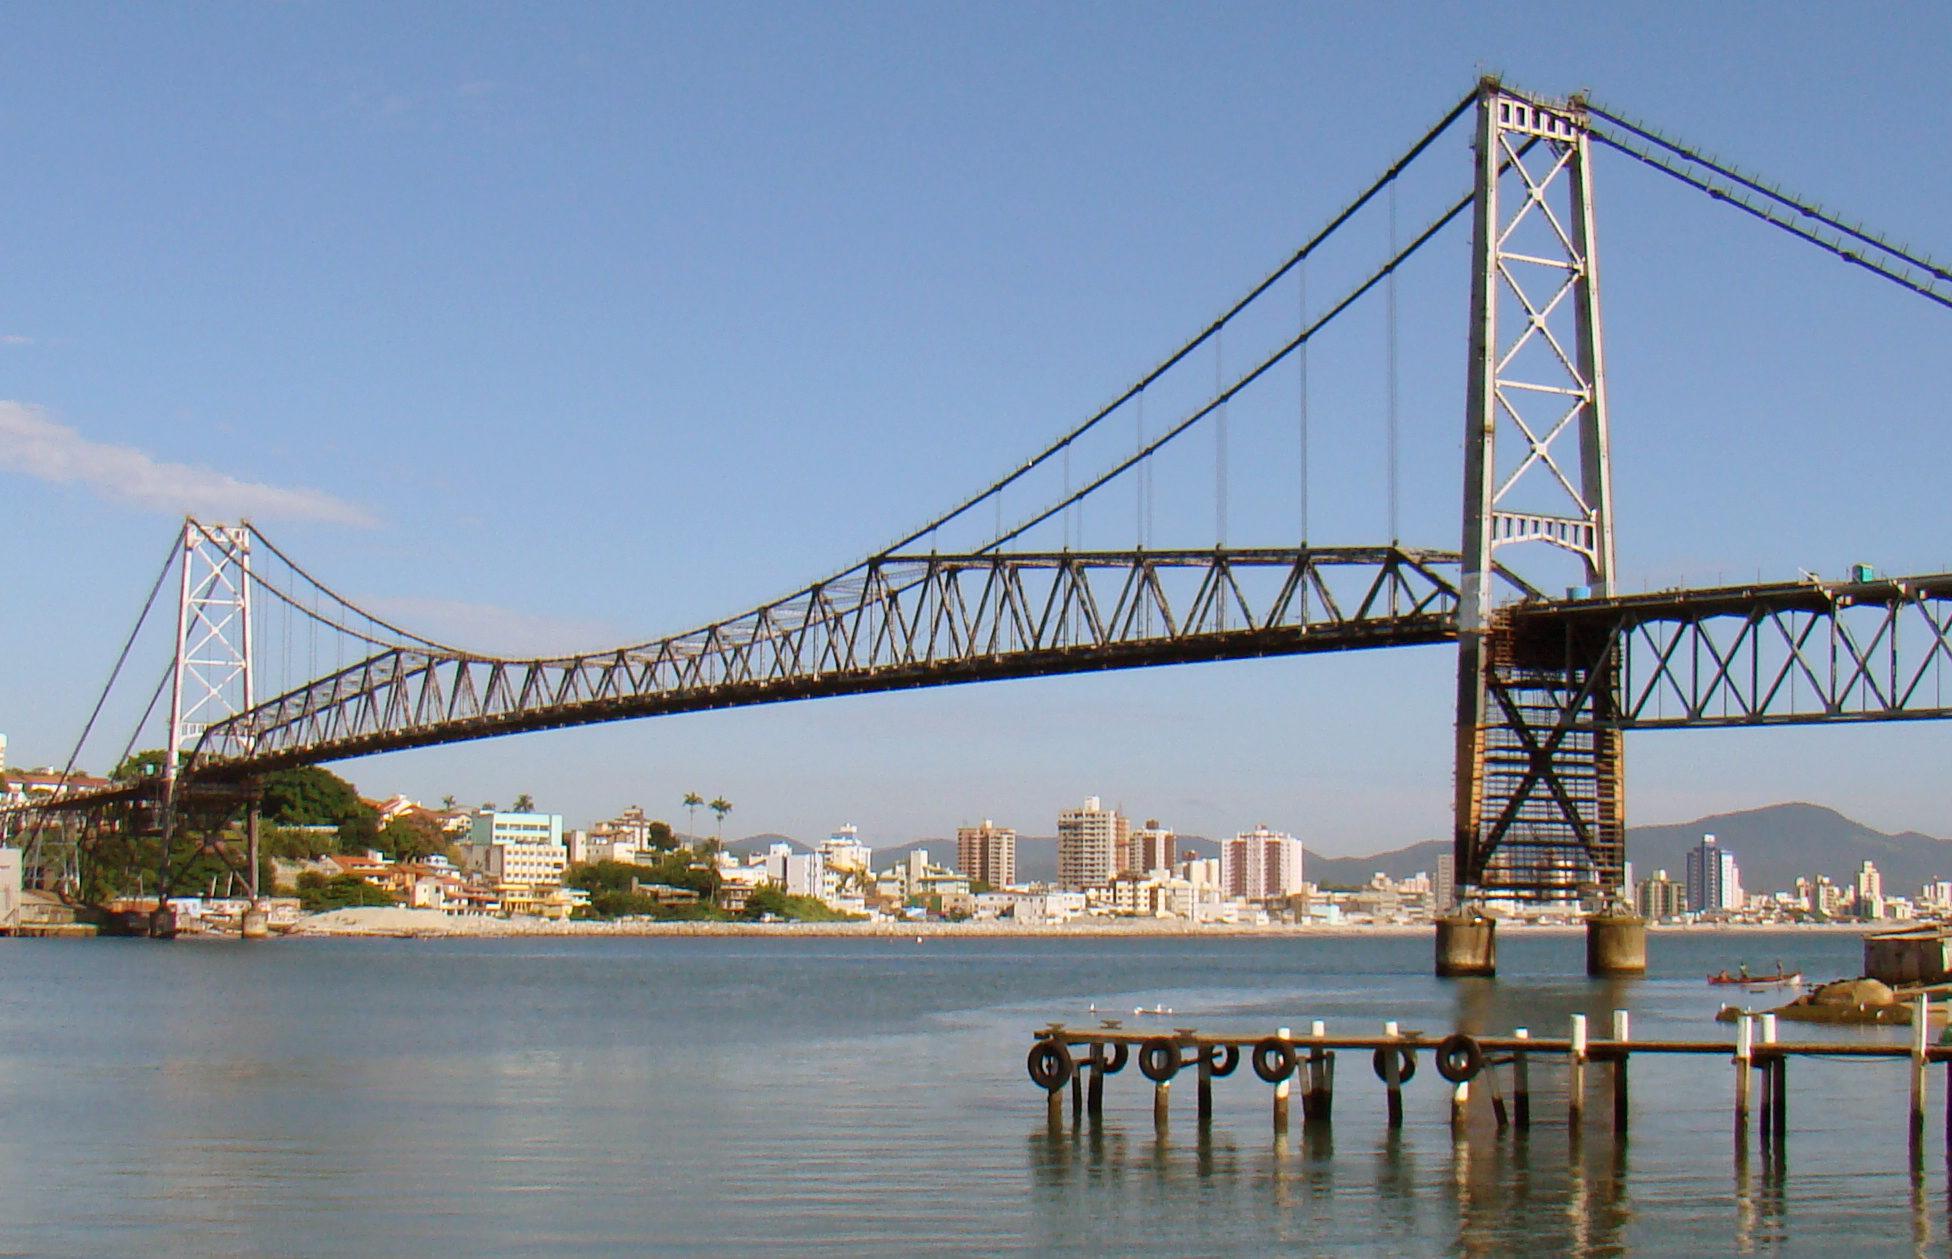 ponte_hercilio_luz_florianopolis-edit